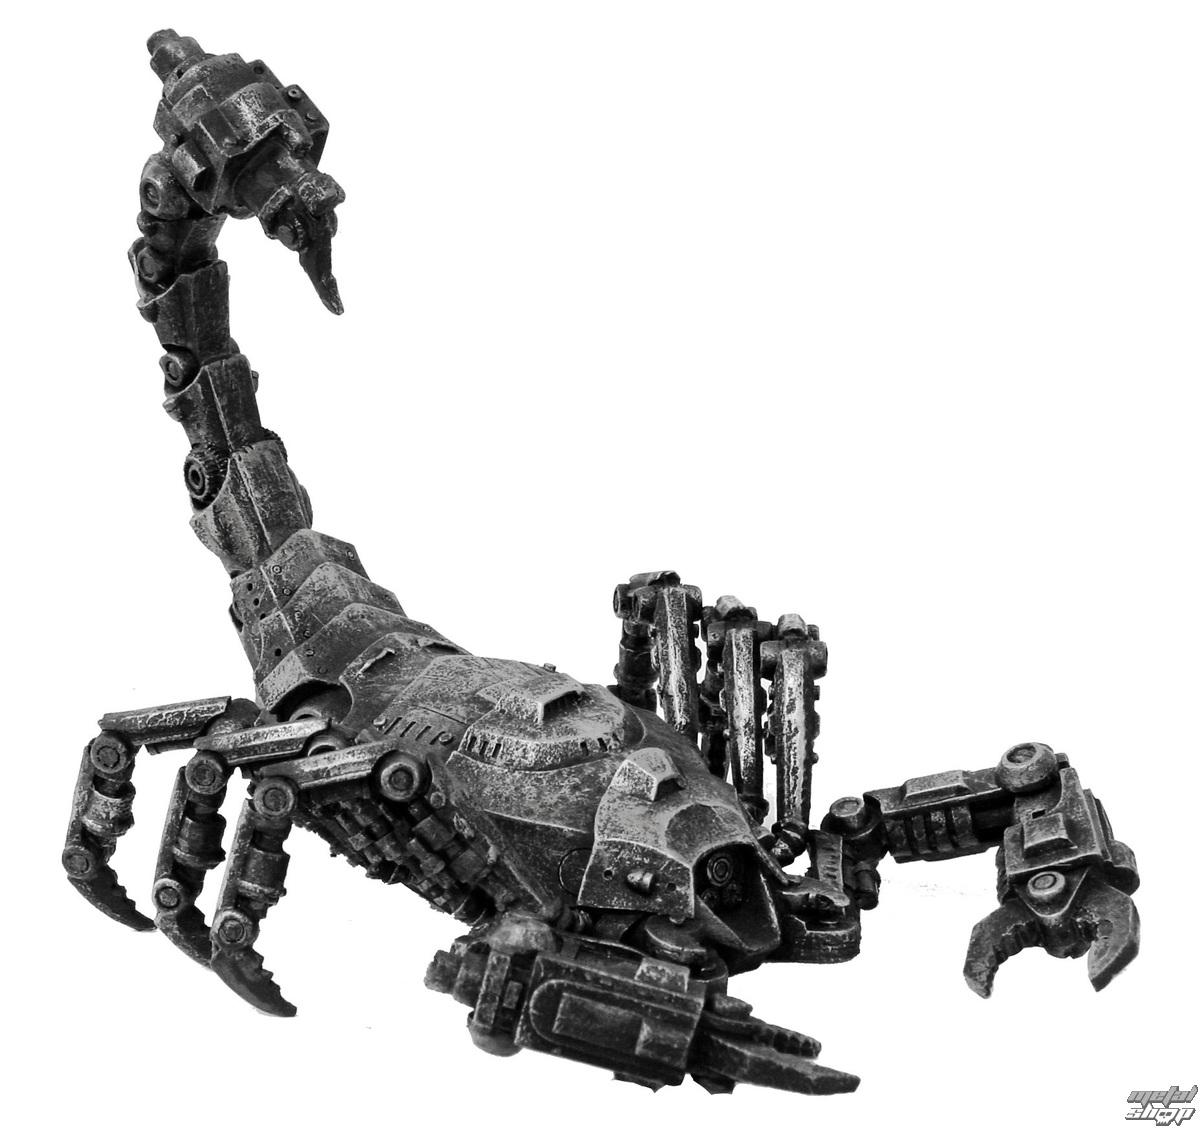 dekorácia Scorpion - 766-6612